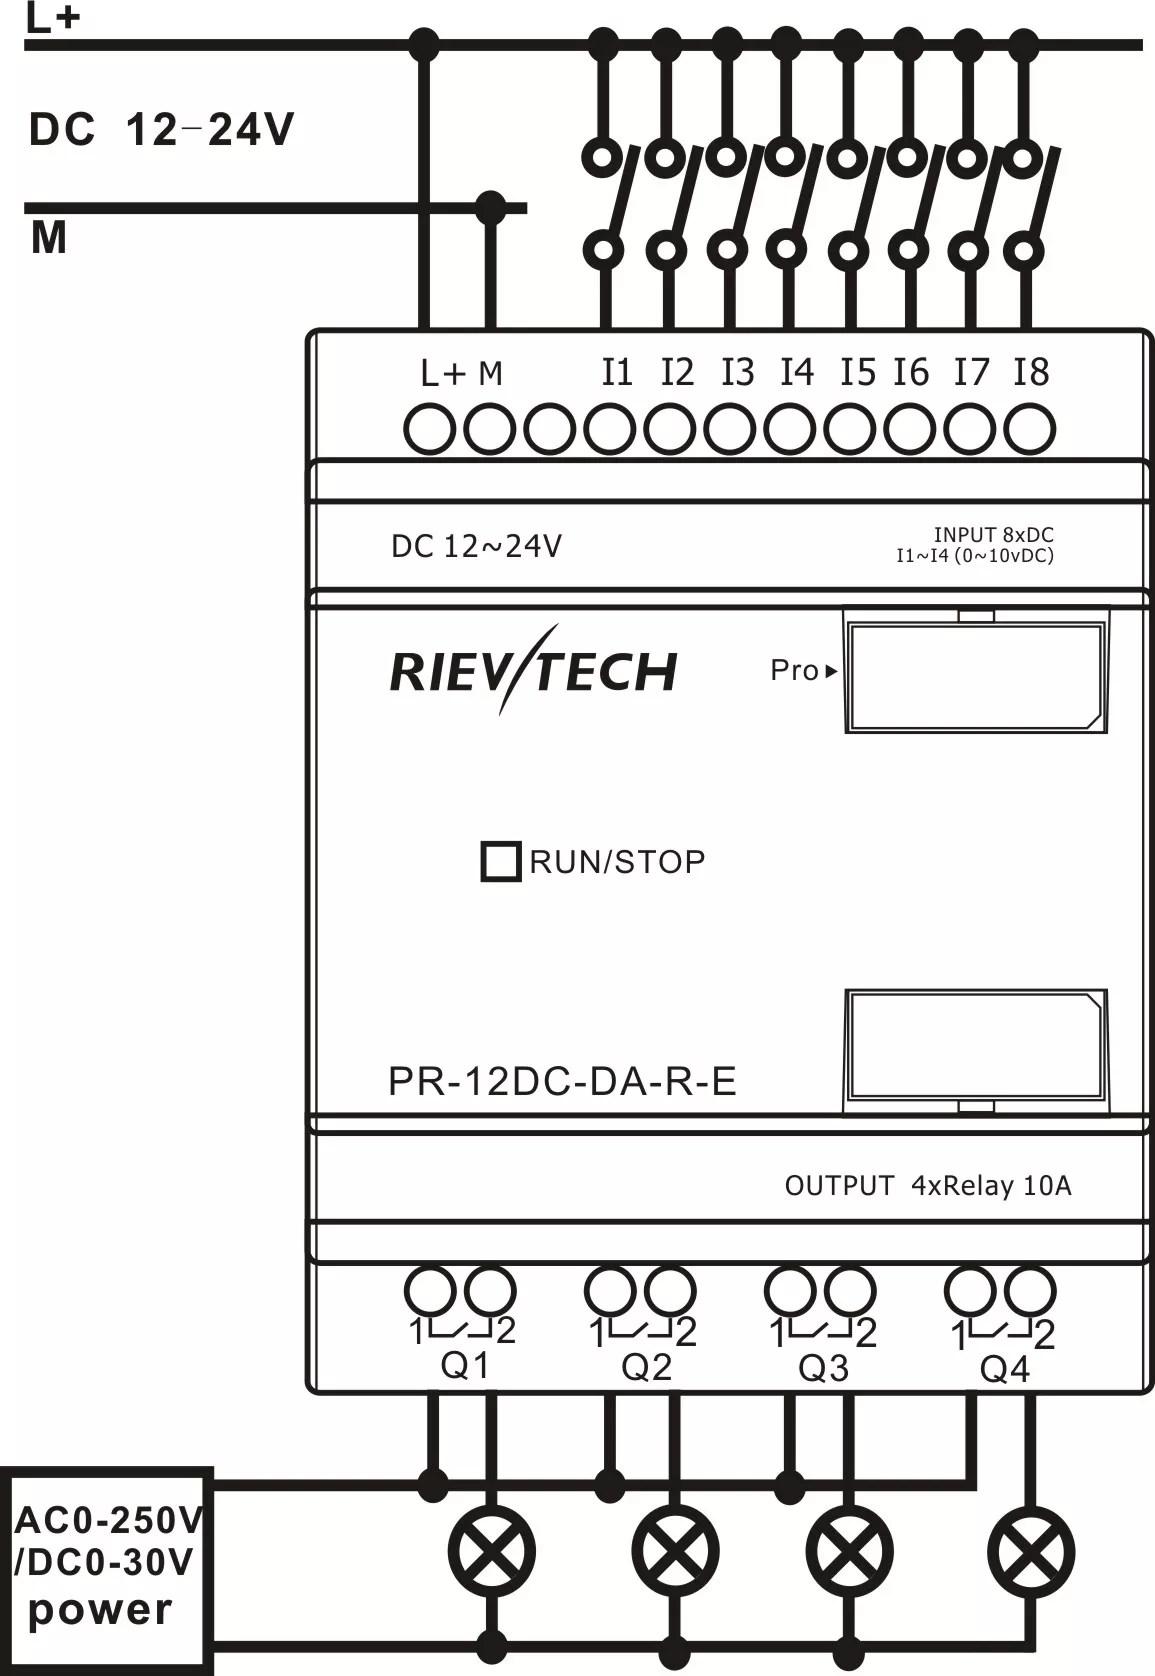 4 cylinder firing order diagram pioneer car stereo deh 150mp wiring 1993 toyota corolla spark plug imageresizertool com